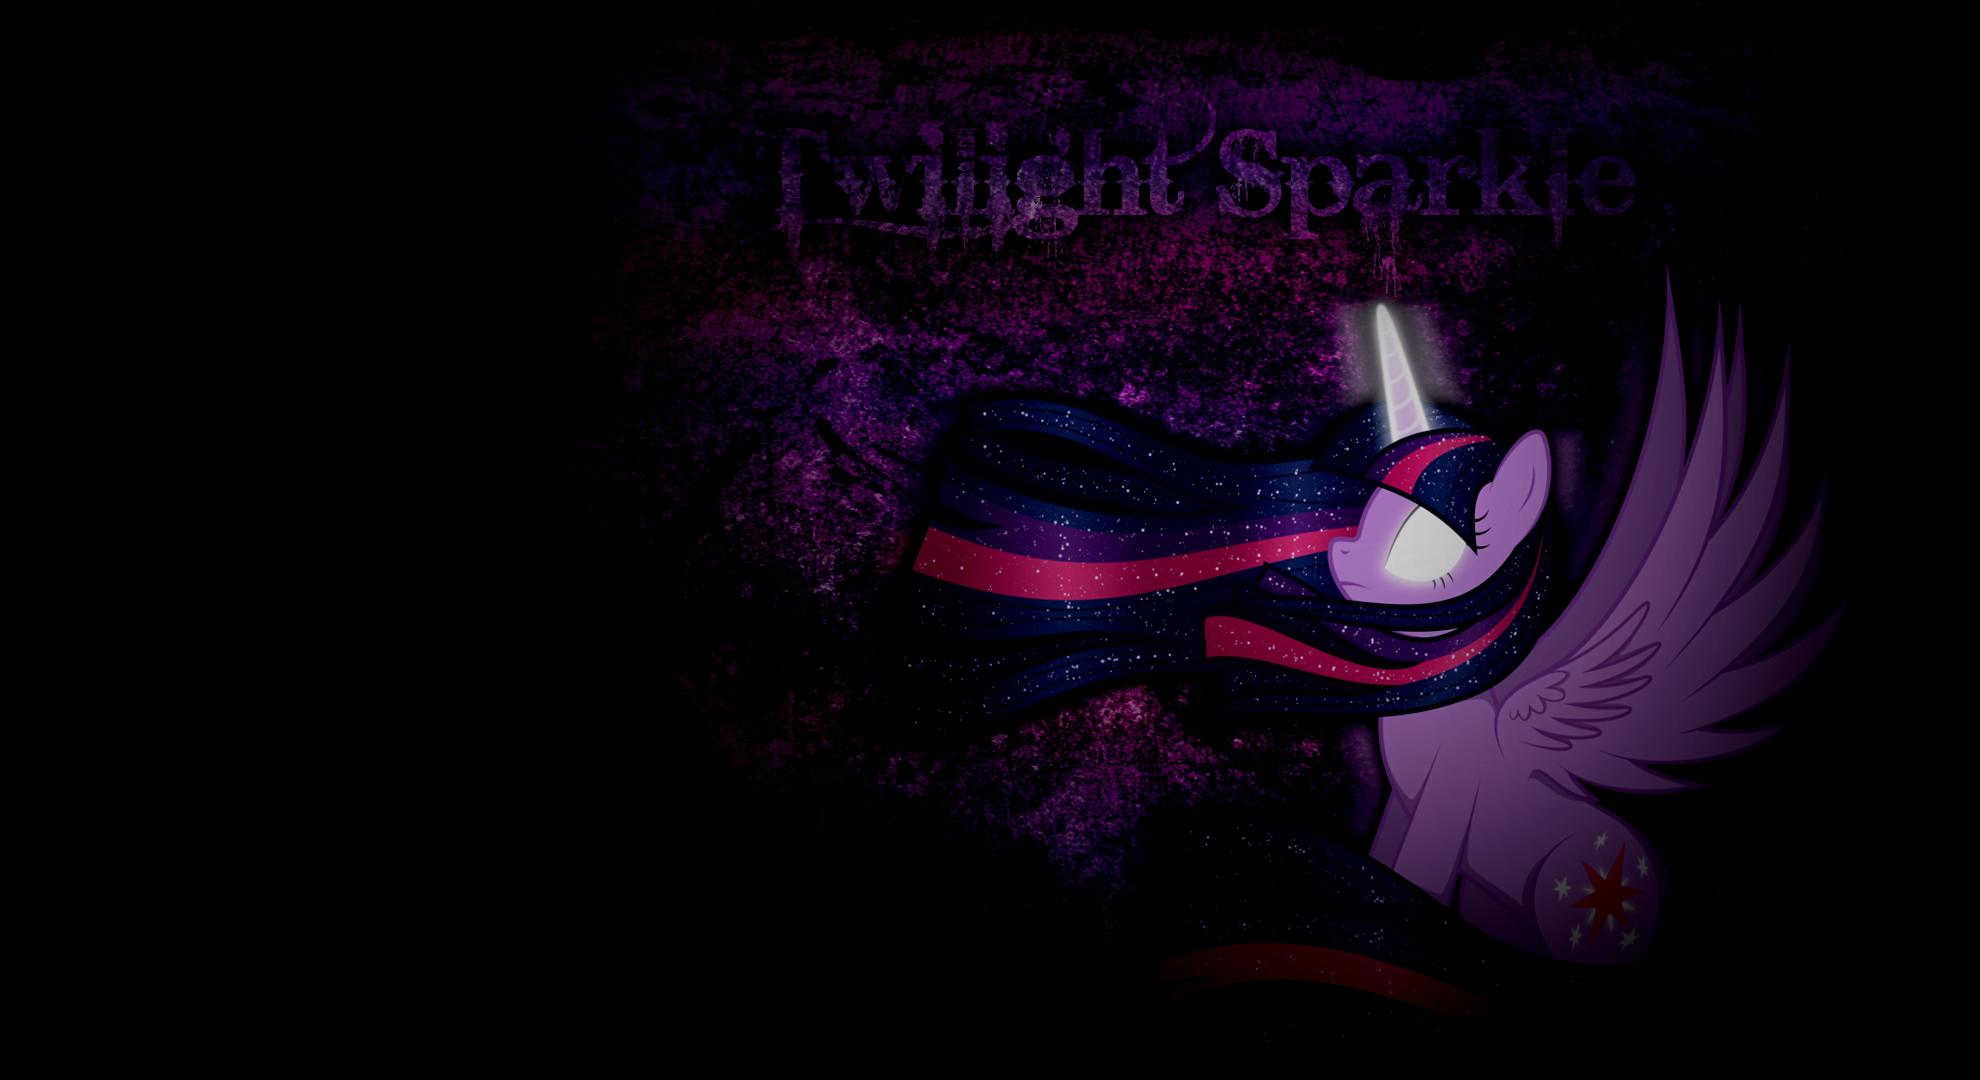 Twilight Sparkle Wallpaper by MLP-Mayhem on DeviantArt